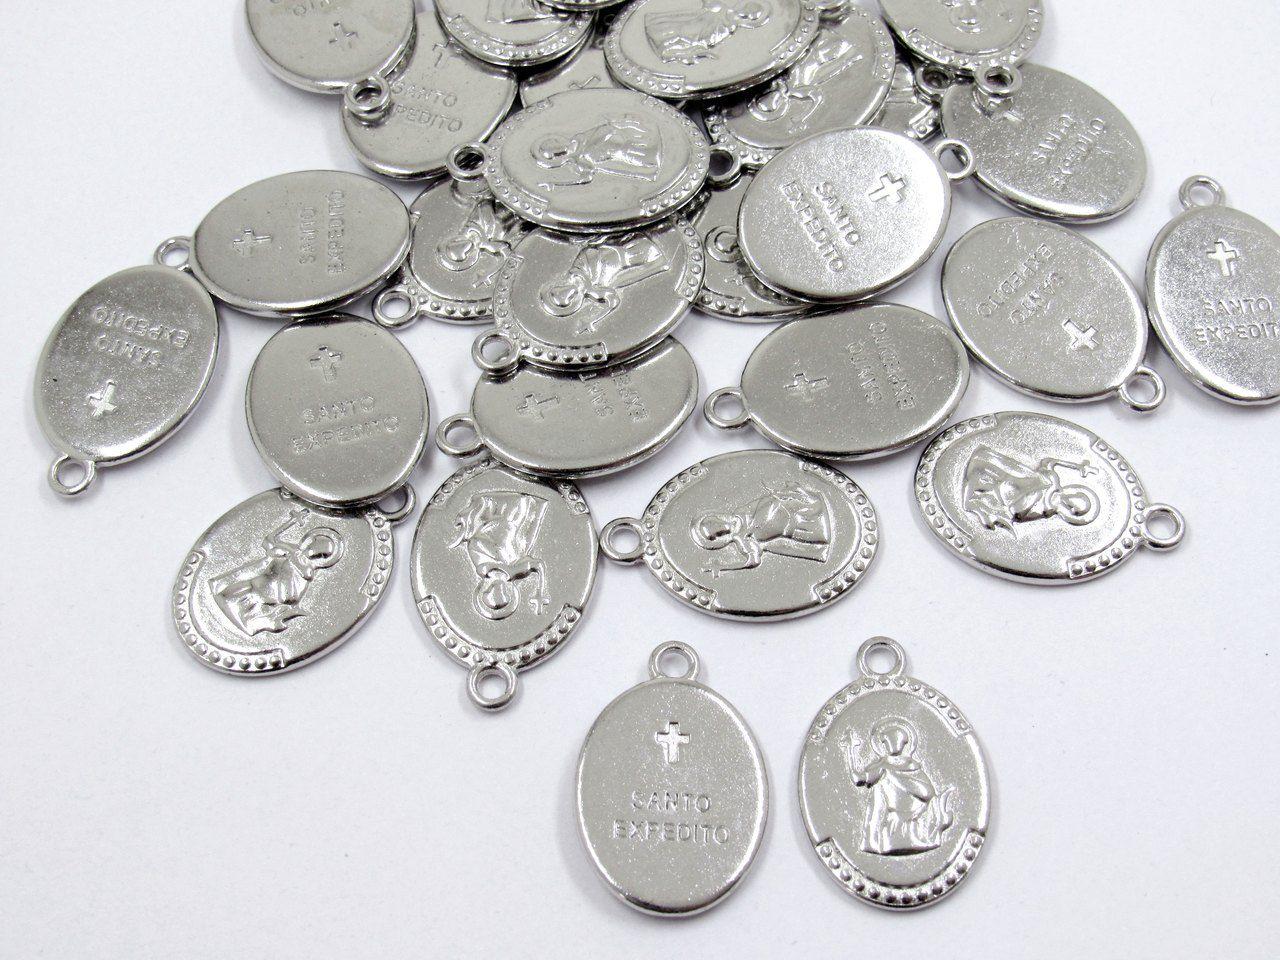 pingente medalha santo expedito 12 unidades